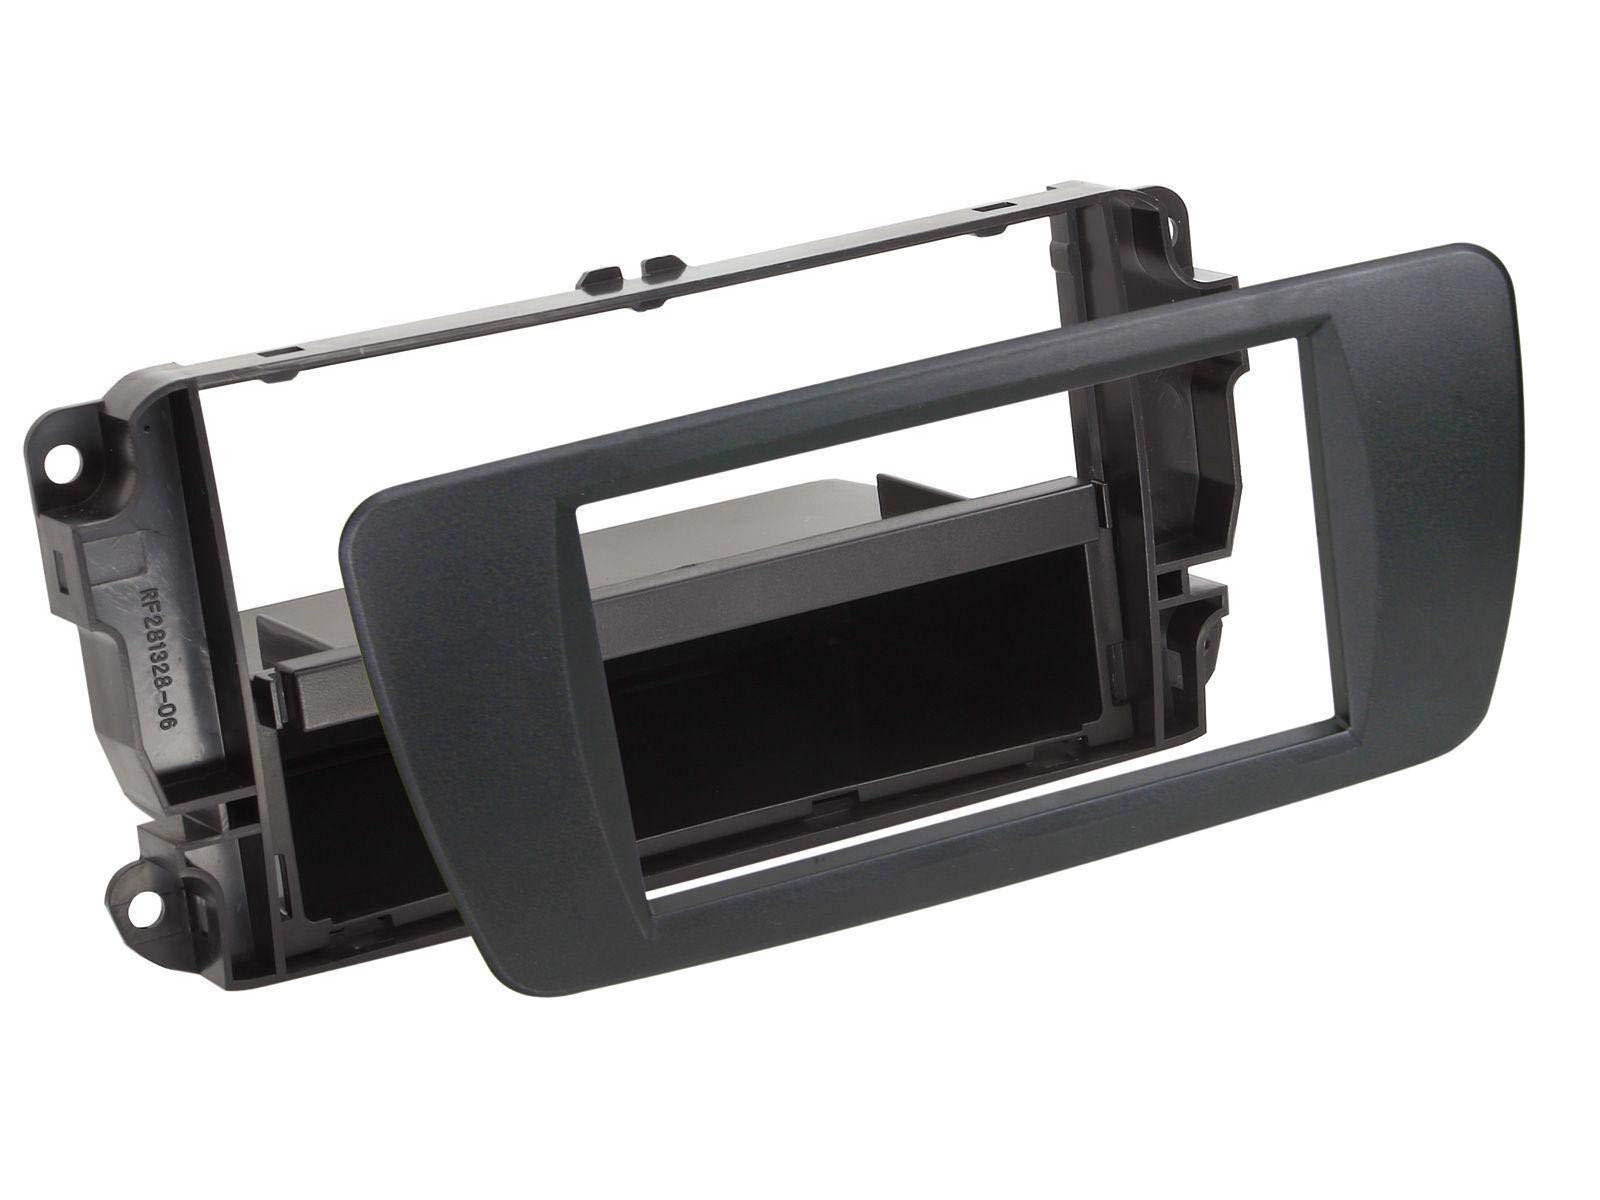 caraudio24-Pioneer-MVH-S120UB-AUX-MP3-1DIN-USB-Autoradio-fr-Seat-Ibiza-6J-ab-08-nitschwarz-AN1